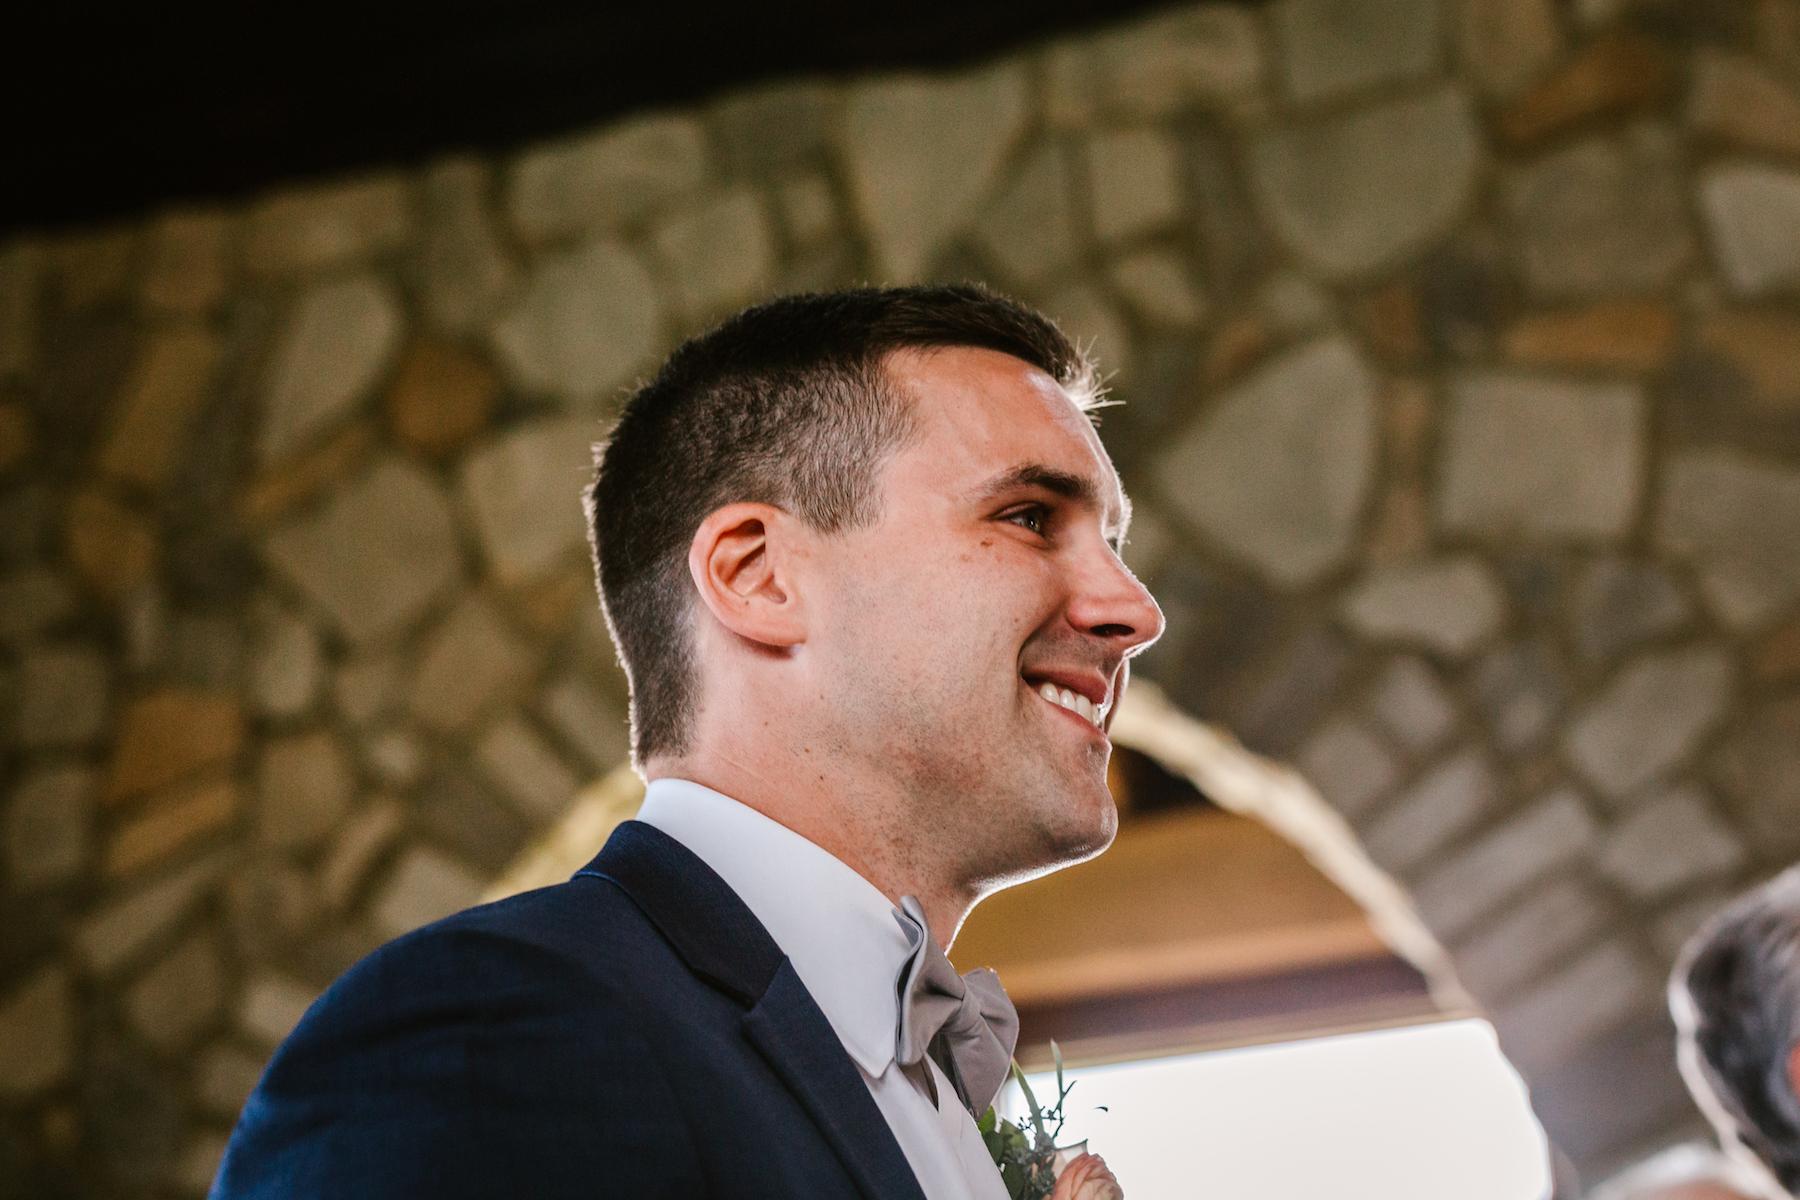 wedding-engagement-photographer-spartanburg-greenville-columbia-carolina-south-north-481.JPG